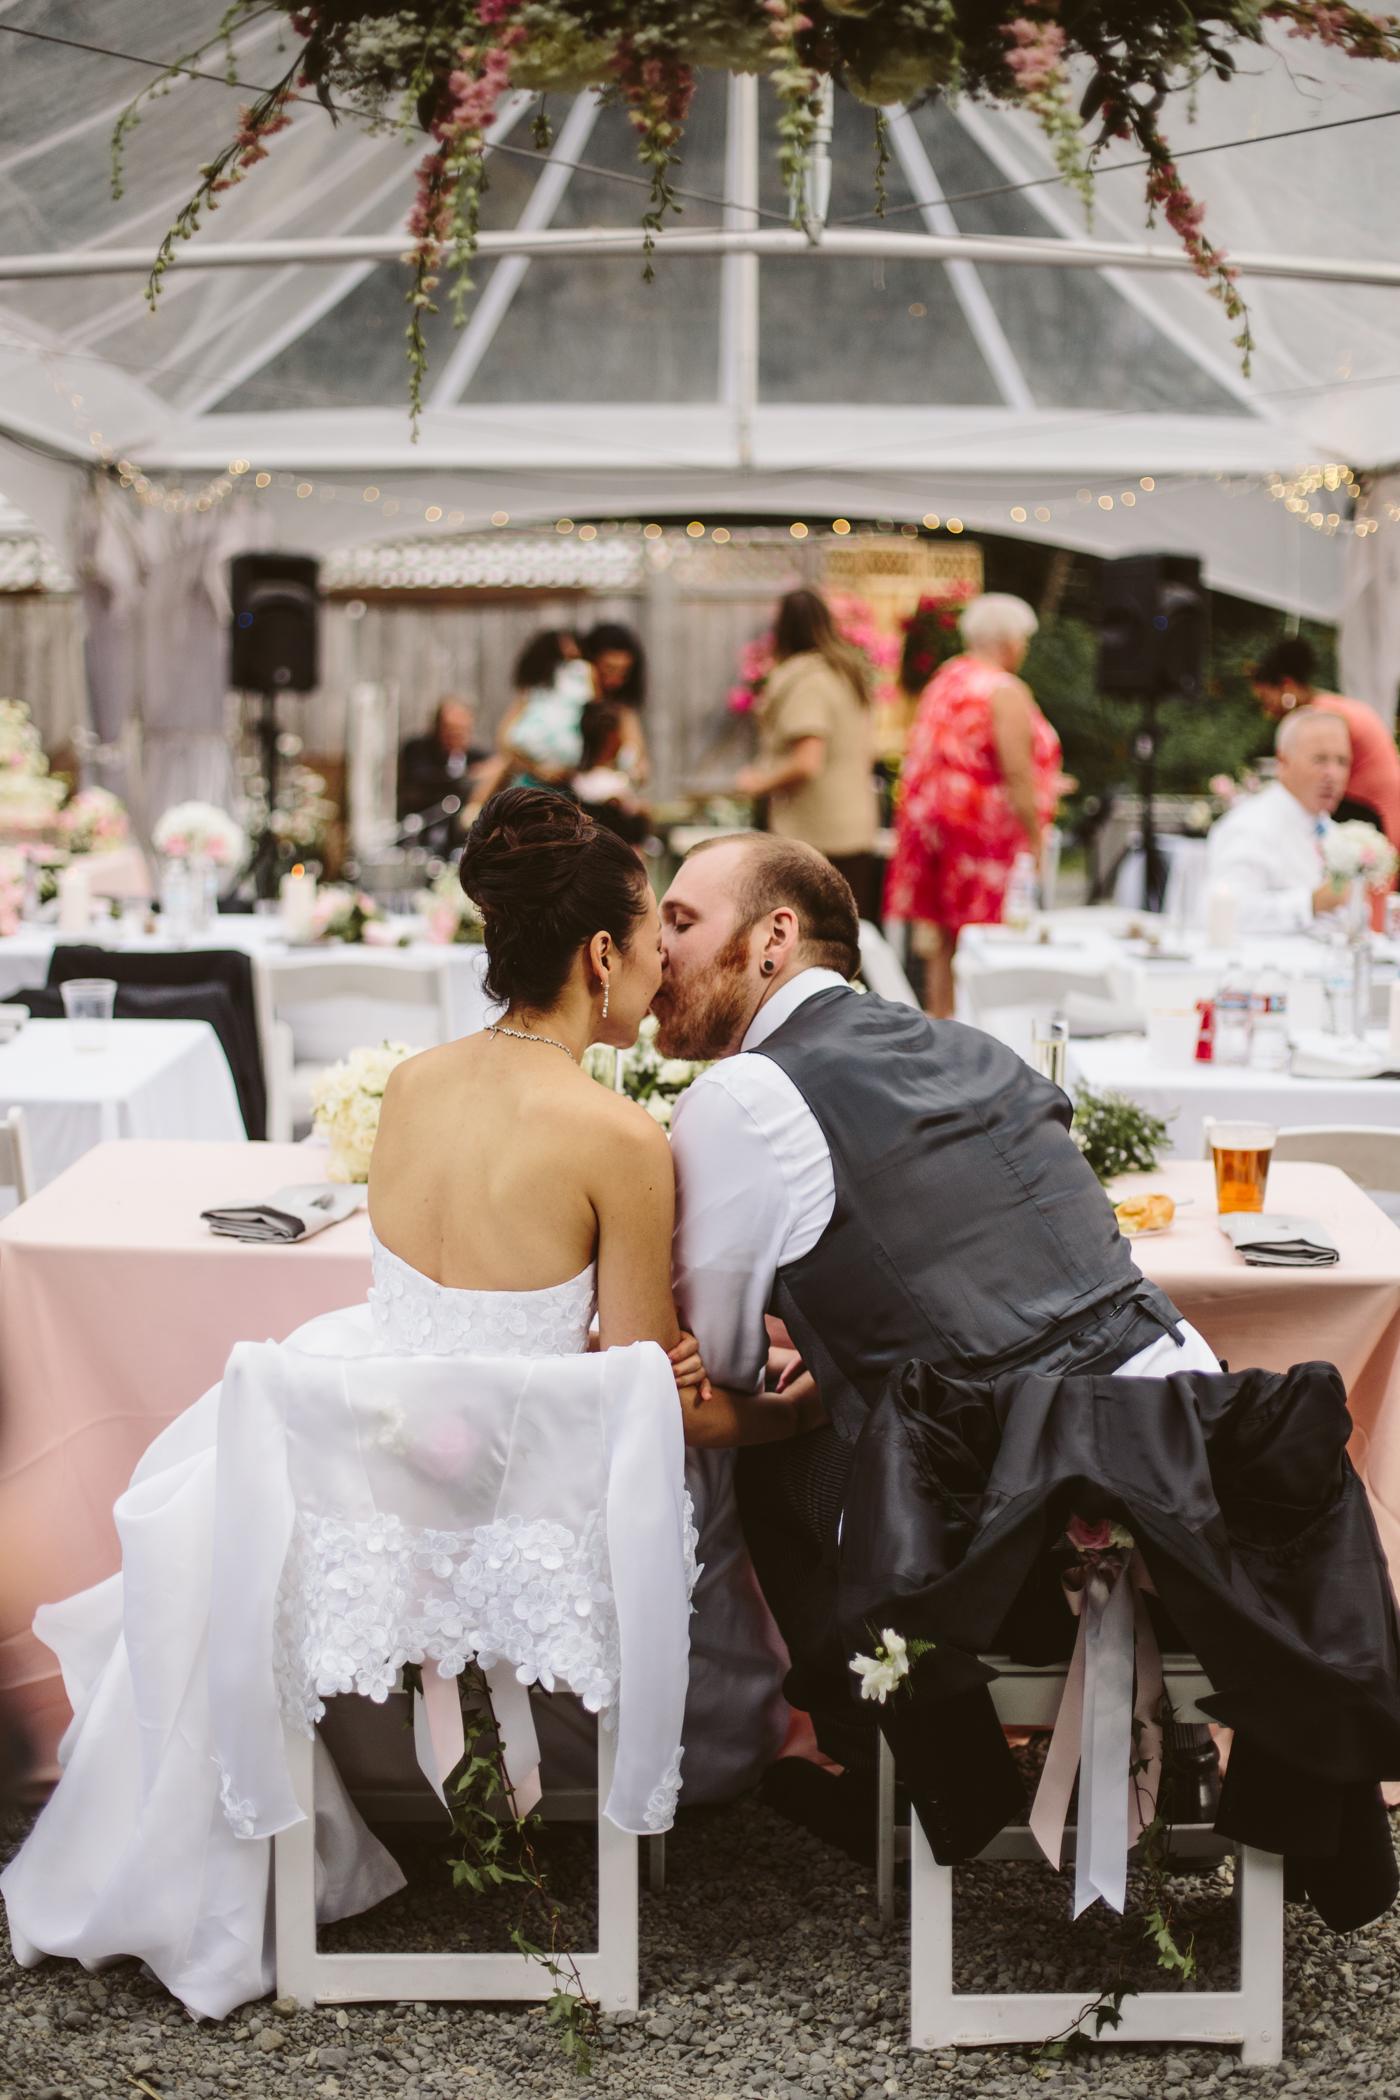 Wedding Photographer in Anchorage